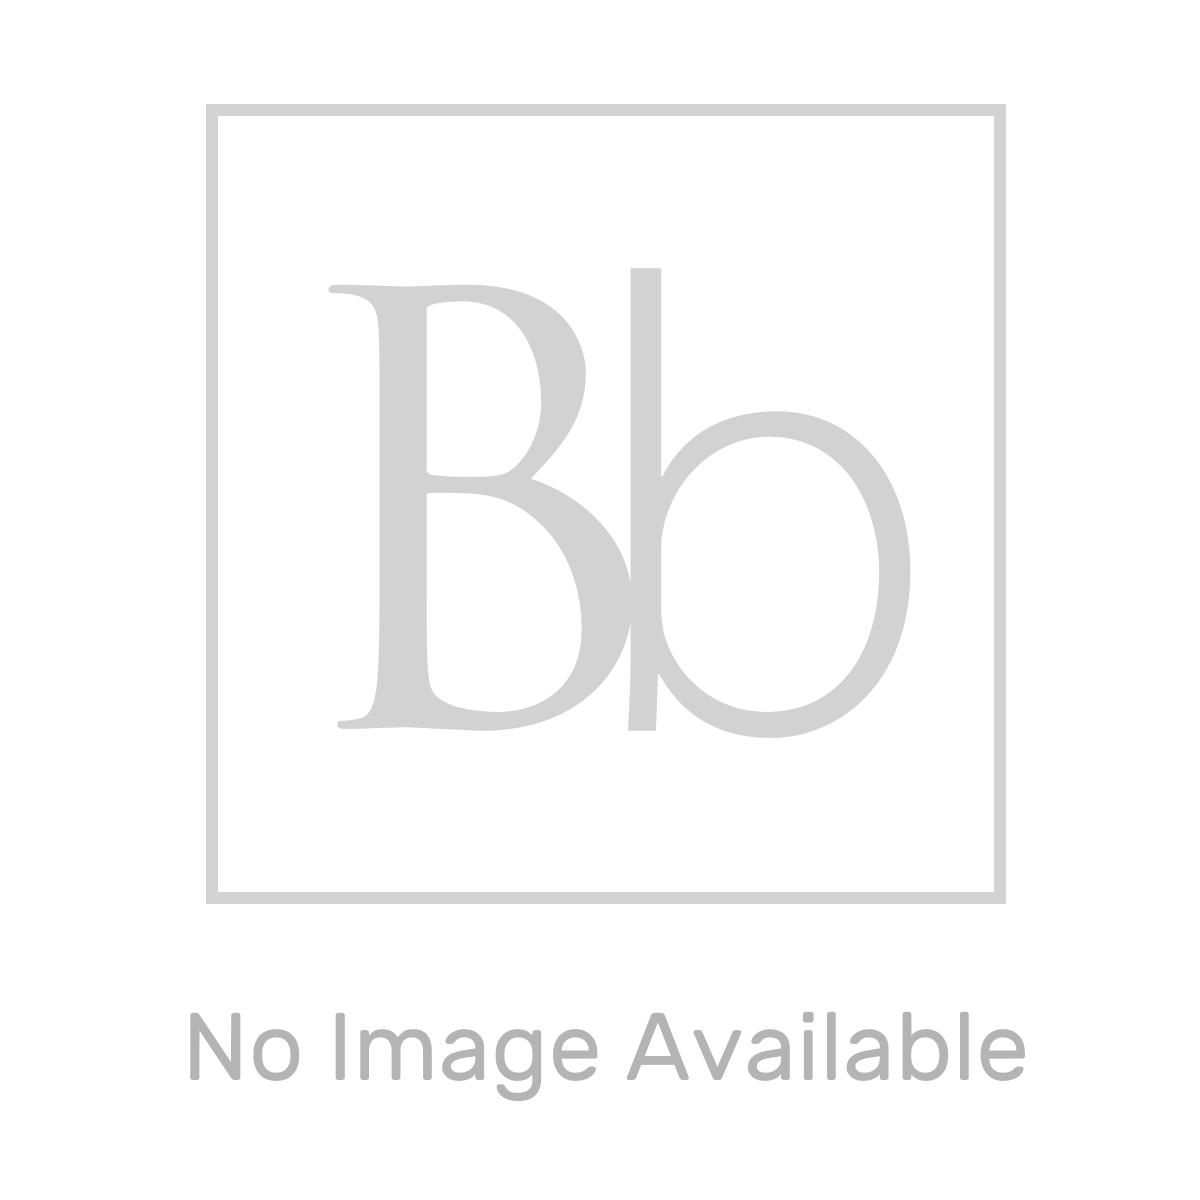 RAK Washington Black Bathroom Mirror Cabinet 650mm Measurements